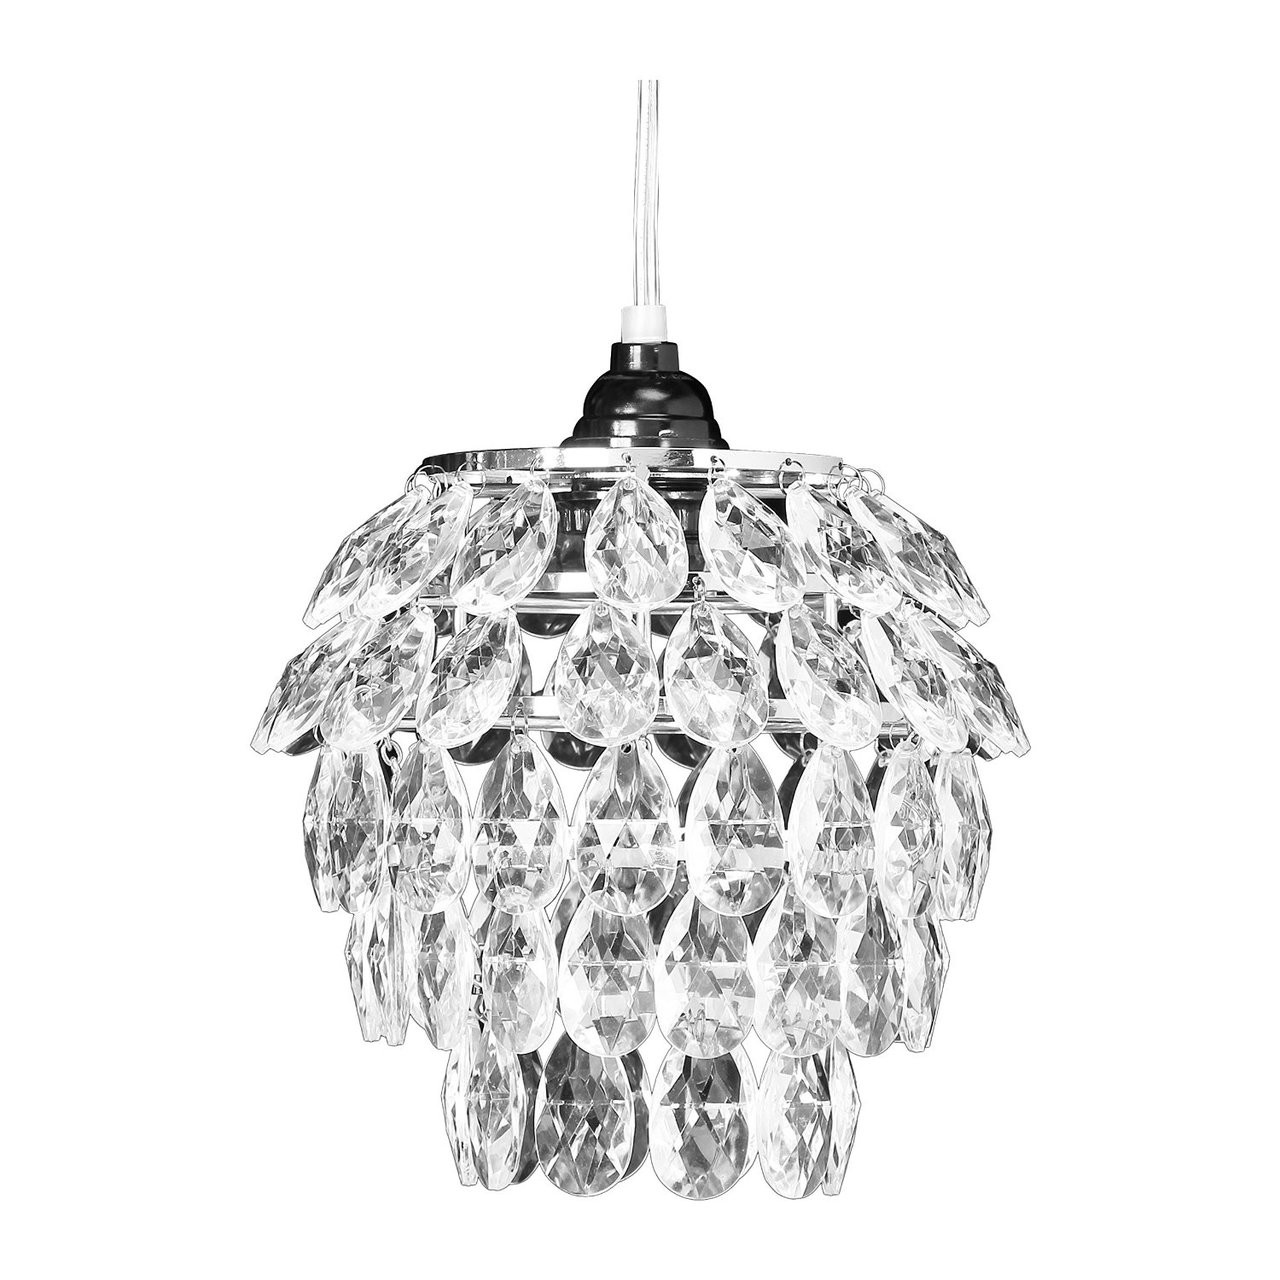 Crystal tulip shaped chandelier events wholesale loading zoom aloadofball Choice Image